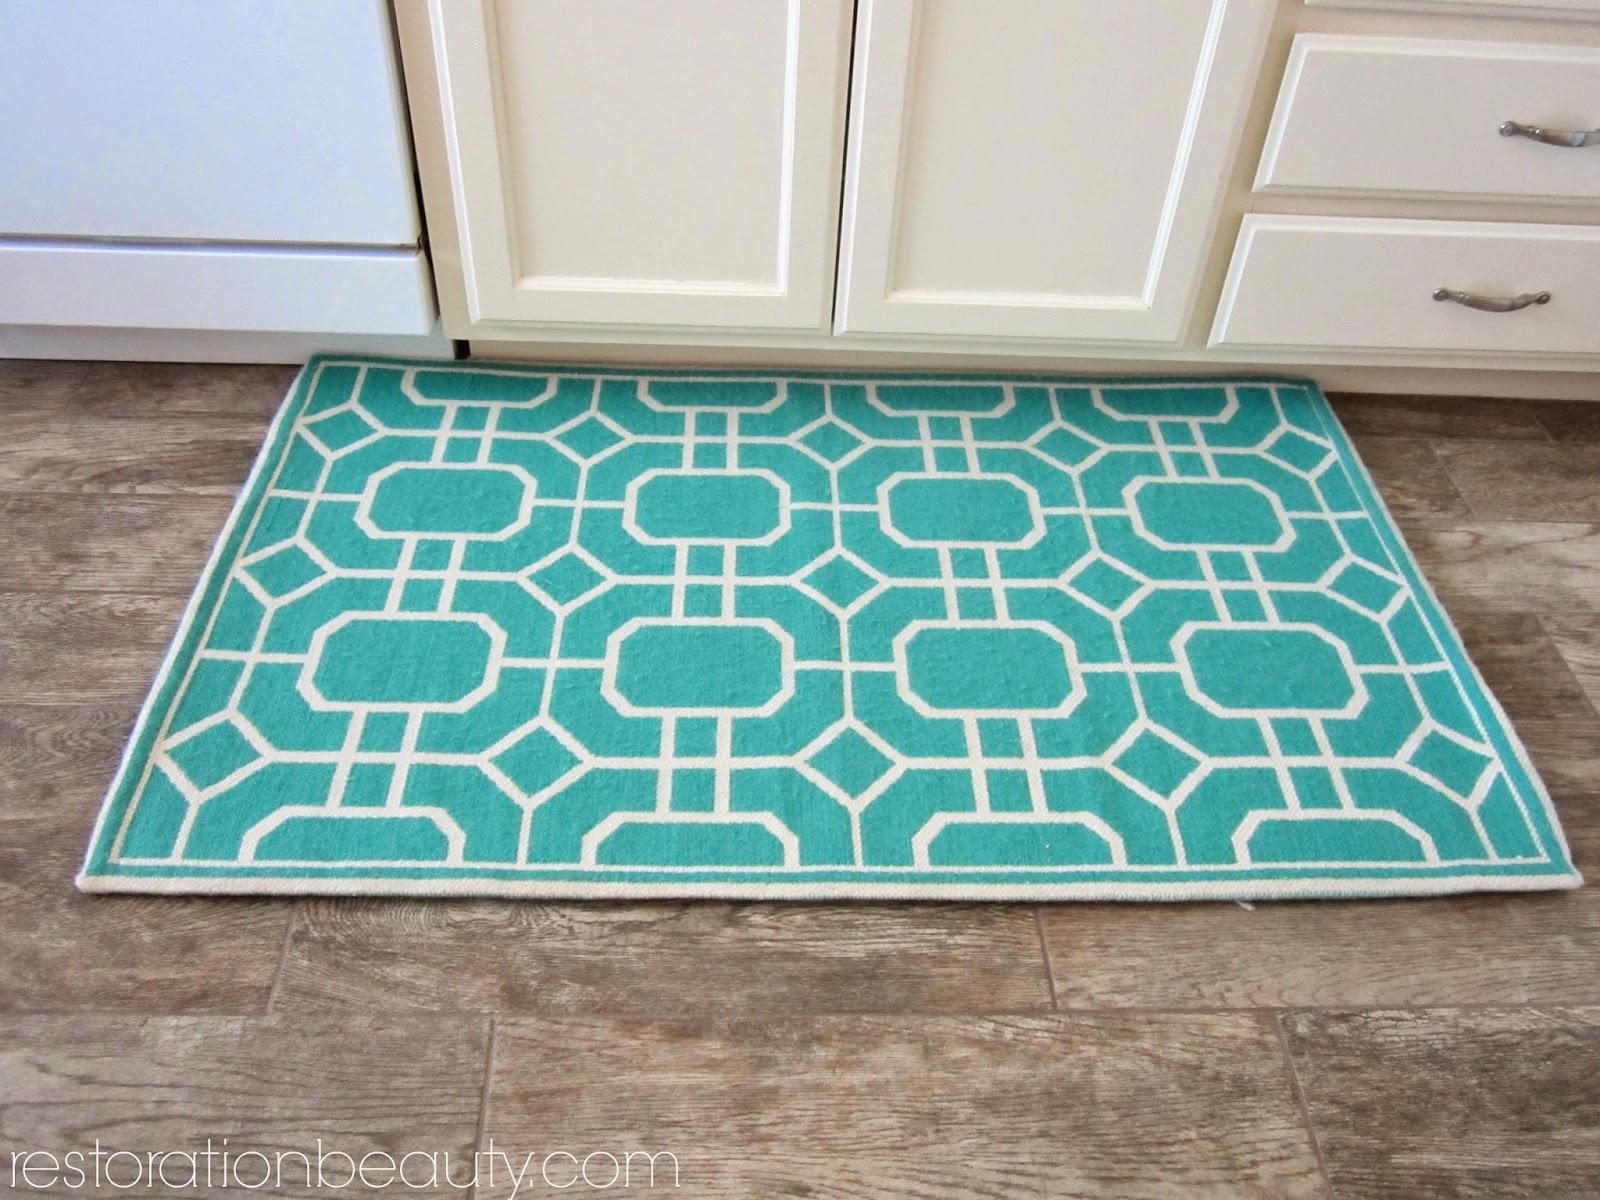 s area residenciarusc com rug foam memory cfee microfiber bounce rugs comfort luxury